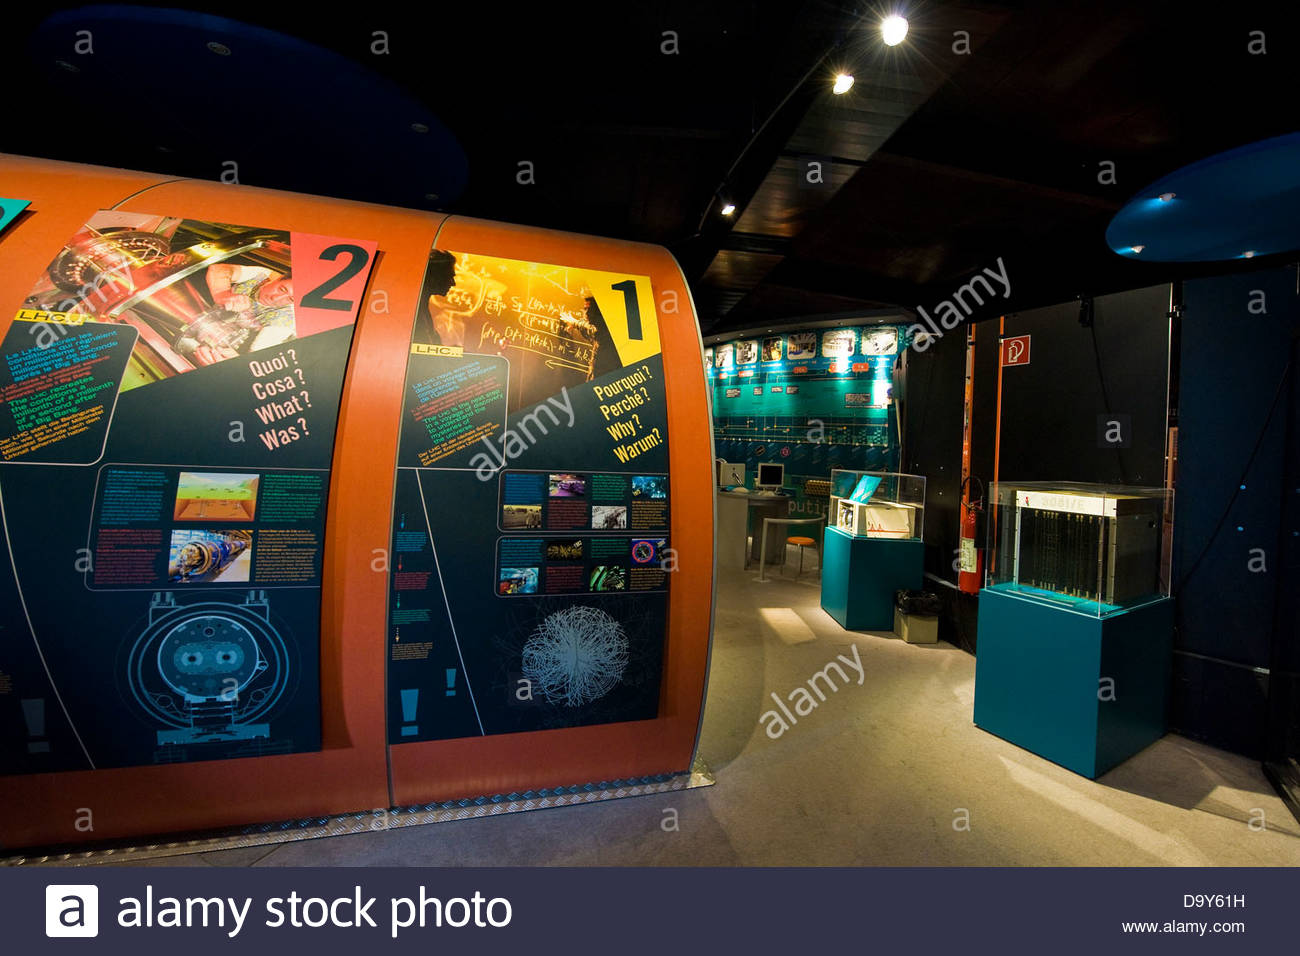 CERN,European Organization for Nuclear Research,Geneva,Switzerland - Stock Image